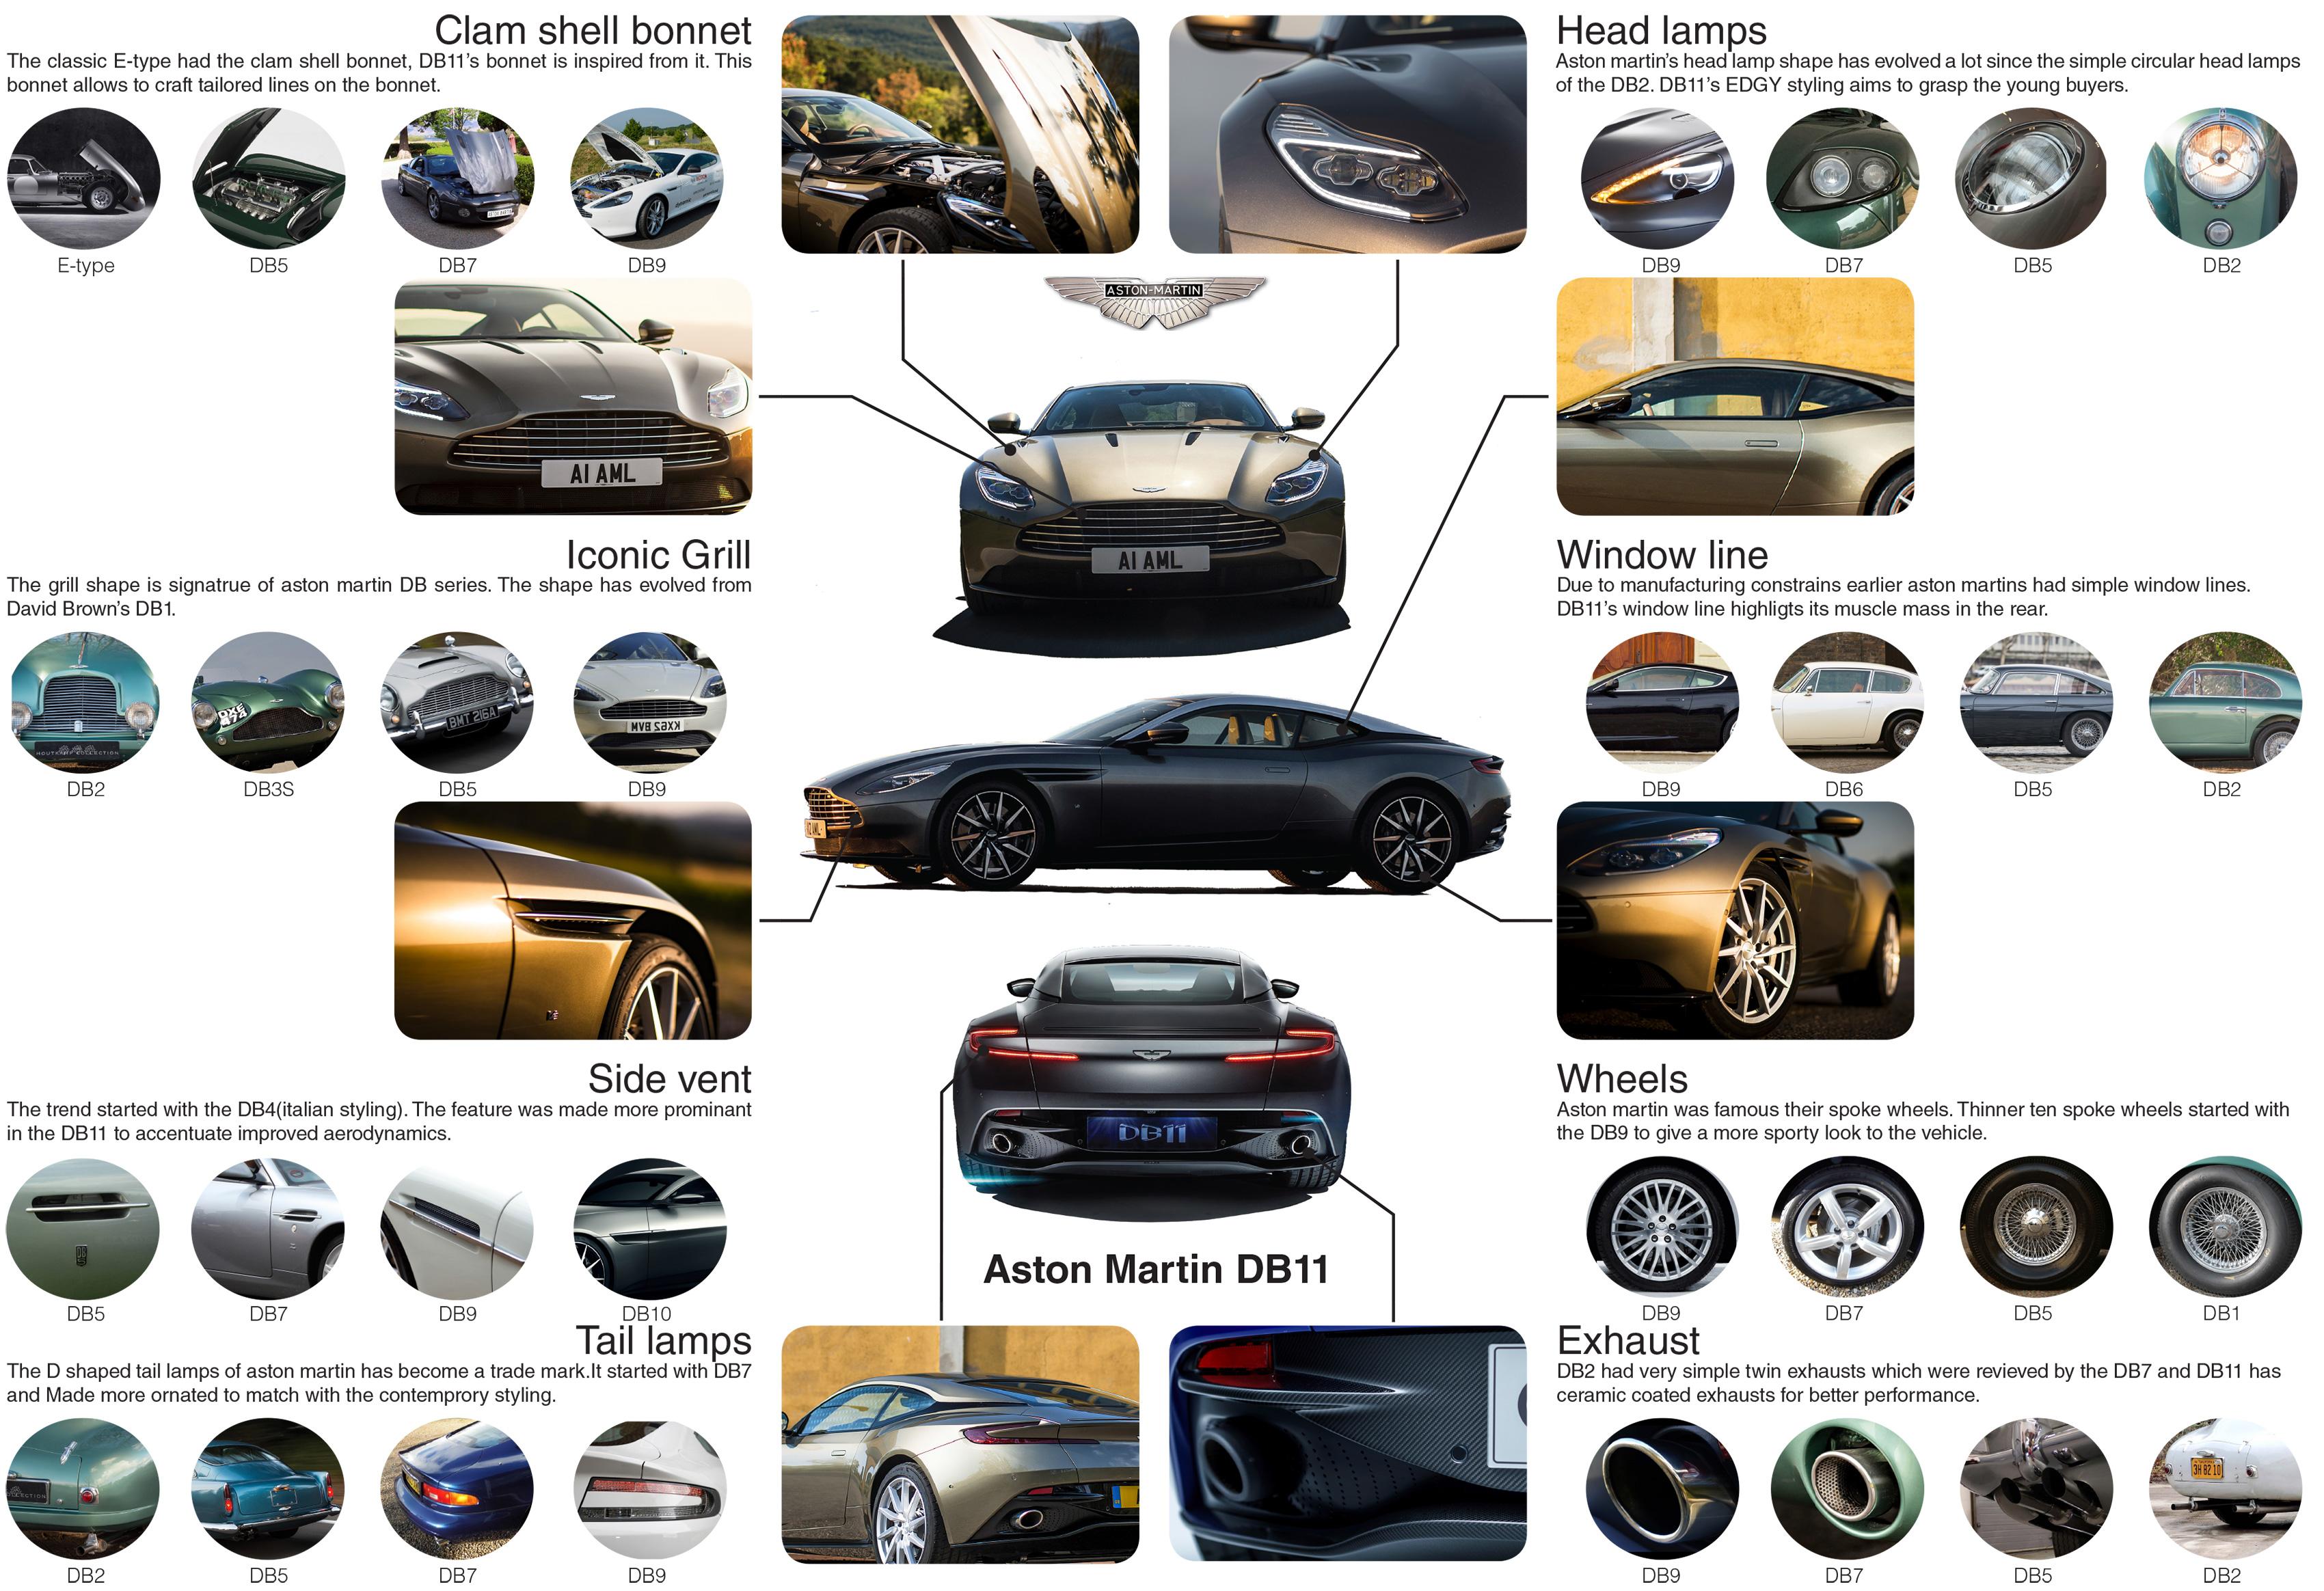 Design Evolution Of Aston Martin Db Sugandh Malhotra